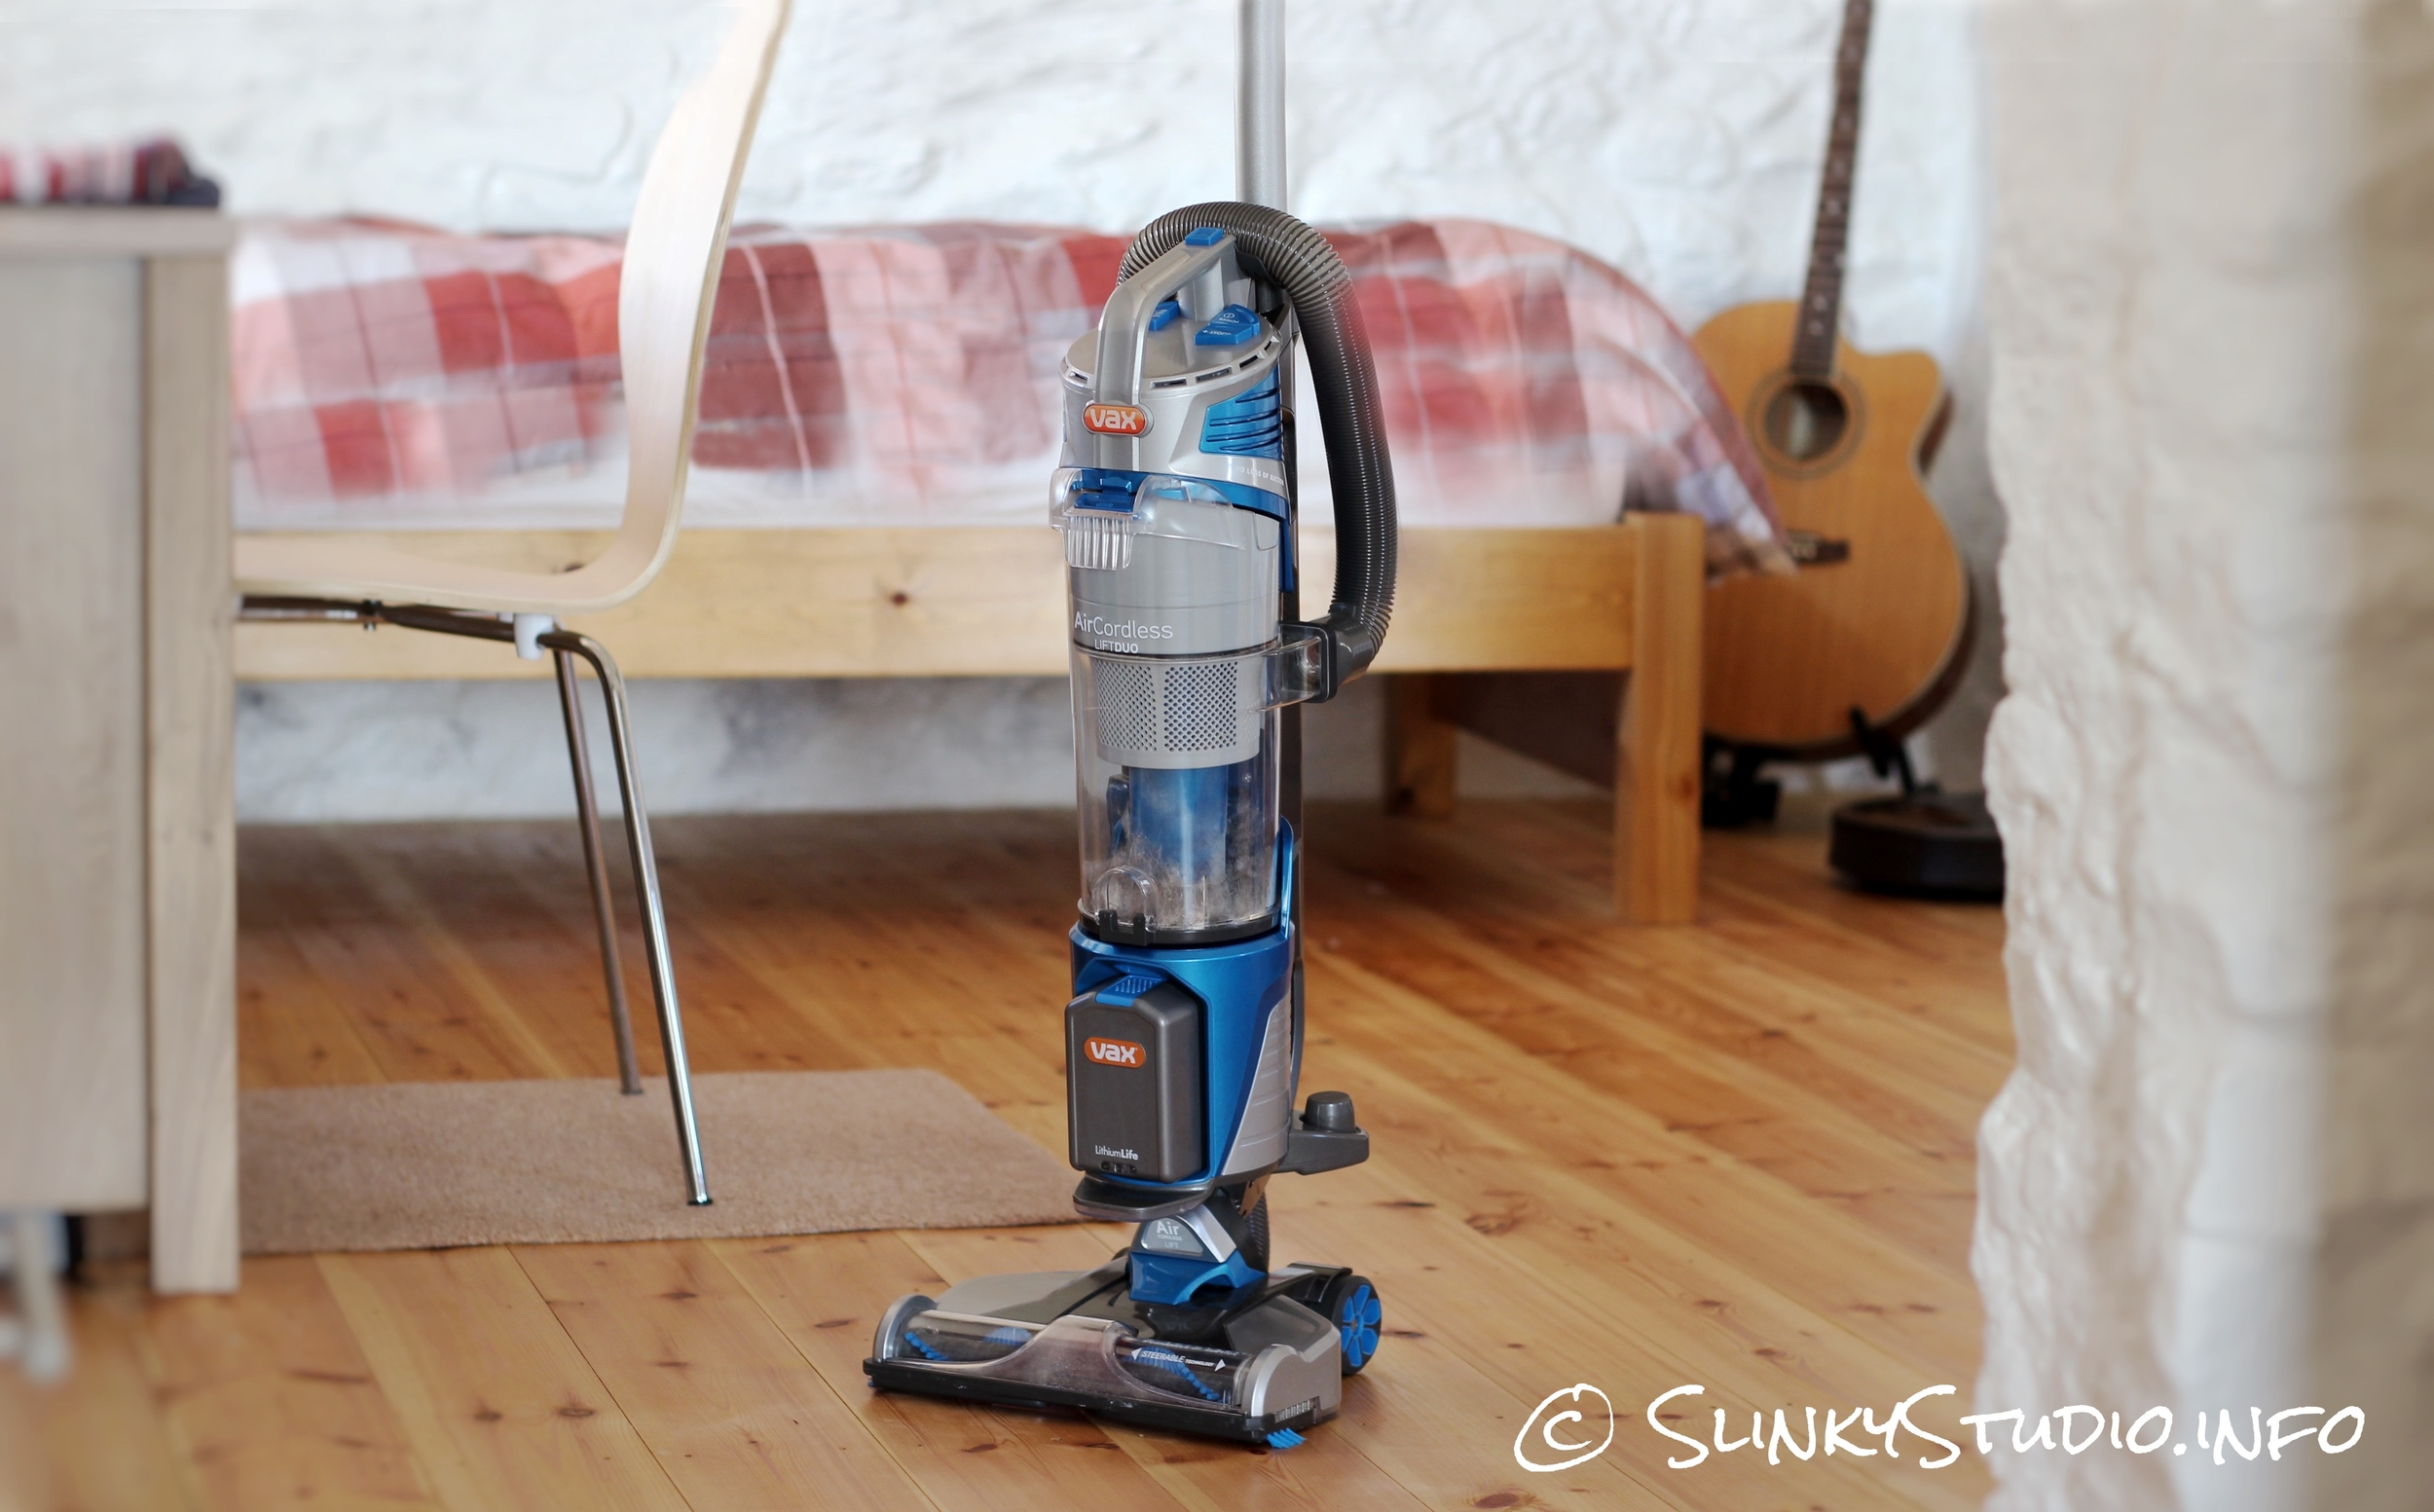 Vax Air Cordless Lift Cleaner.jpg